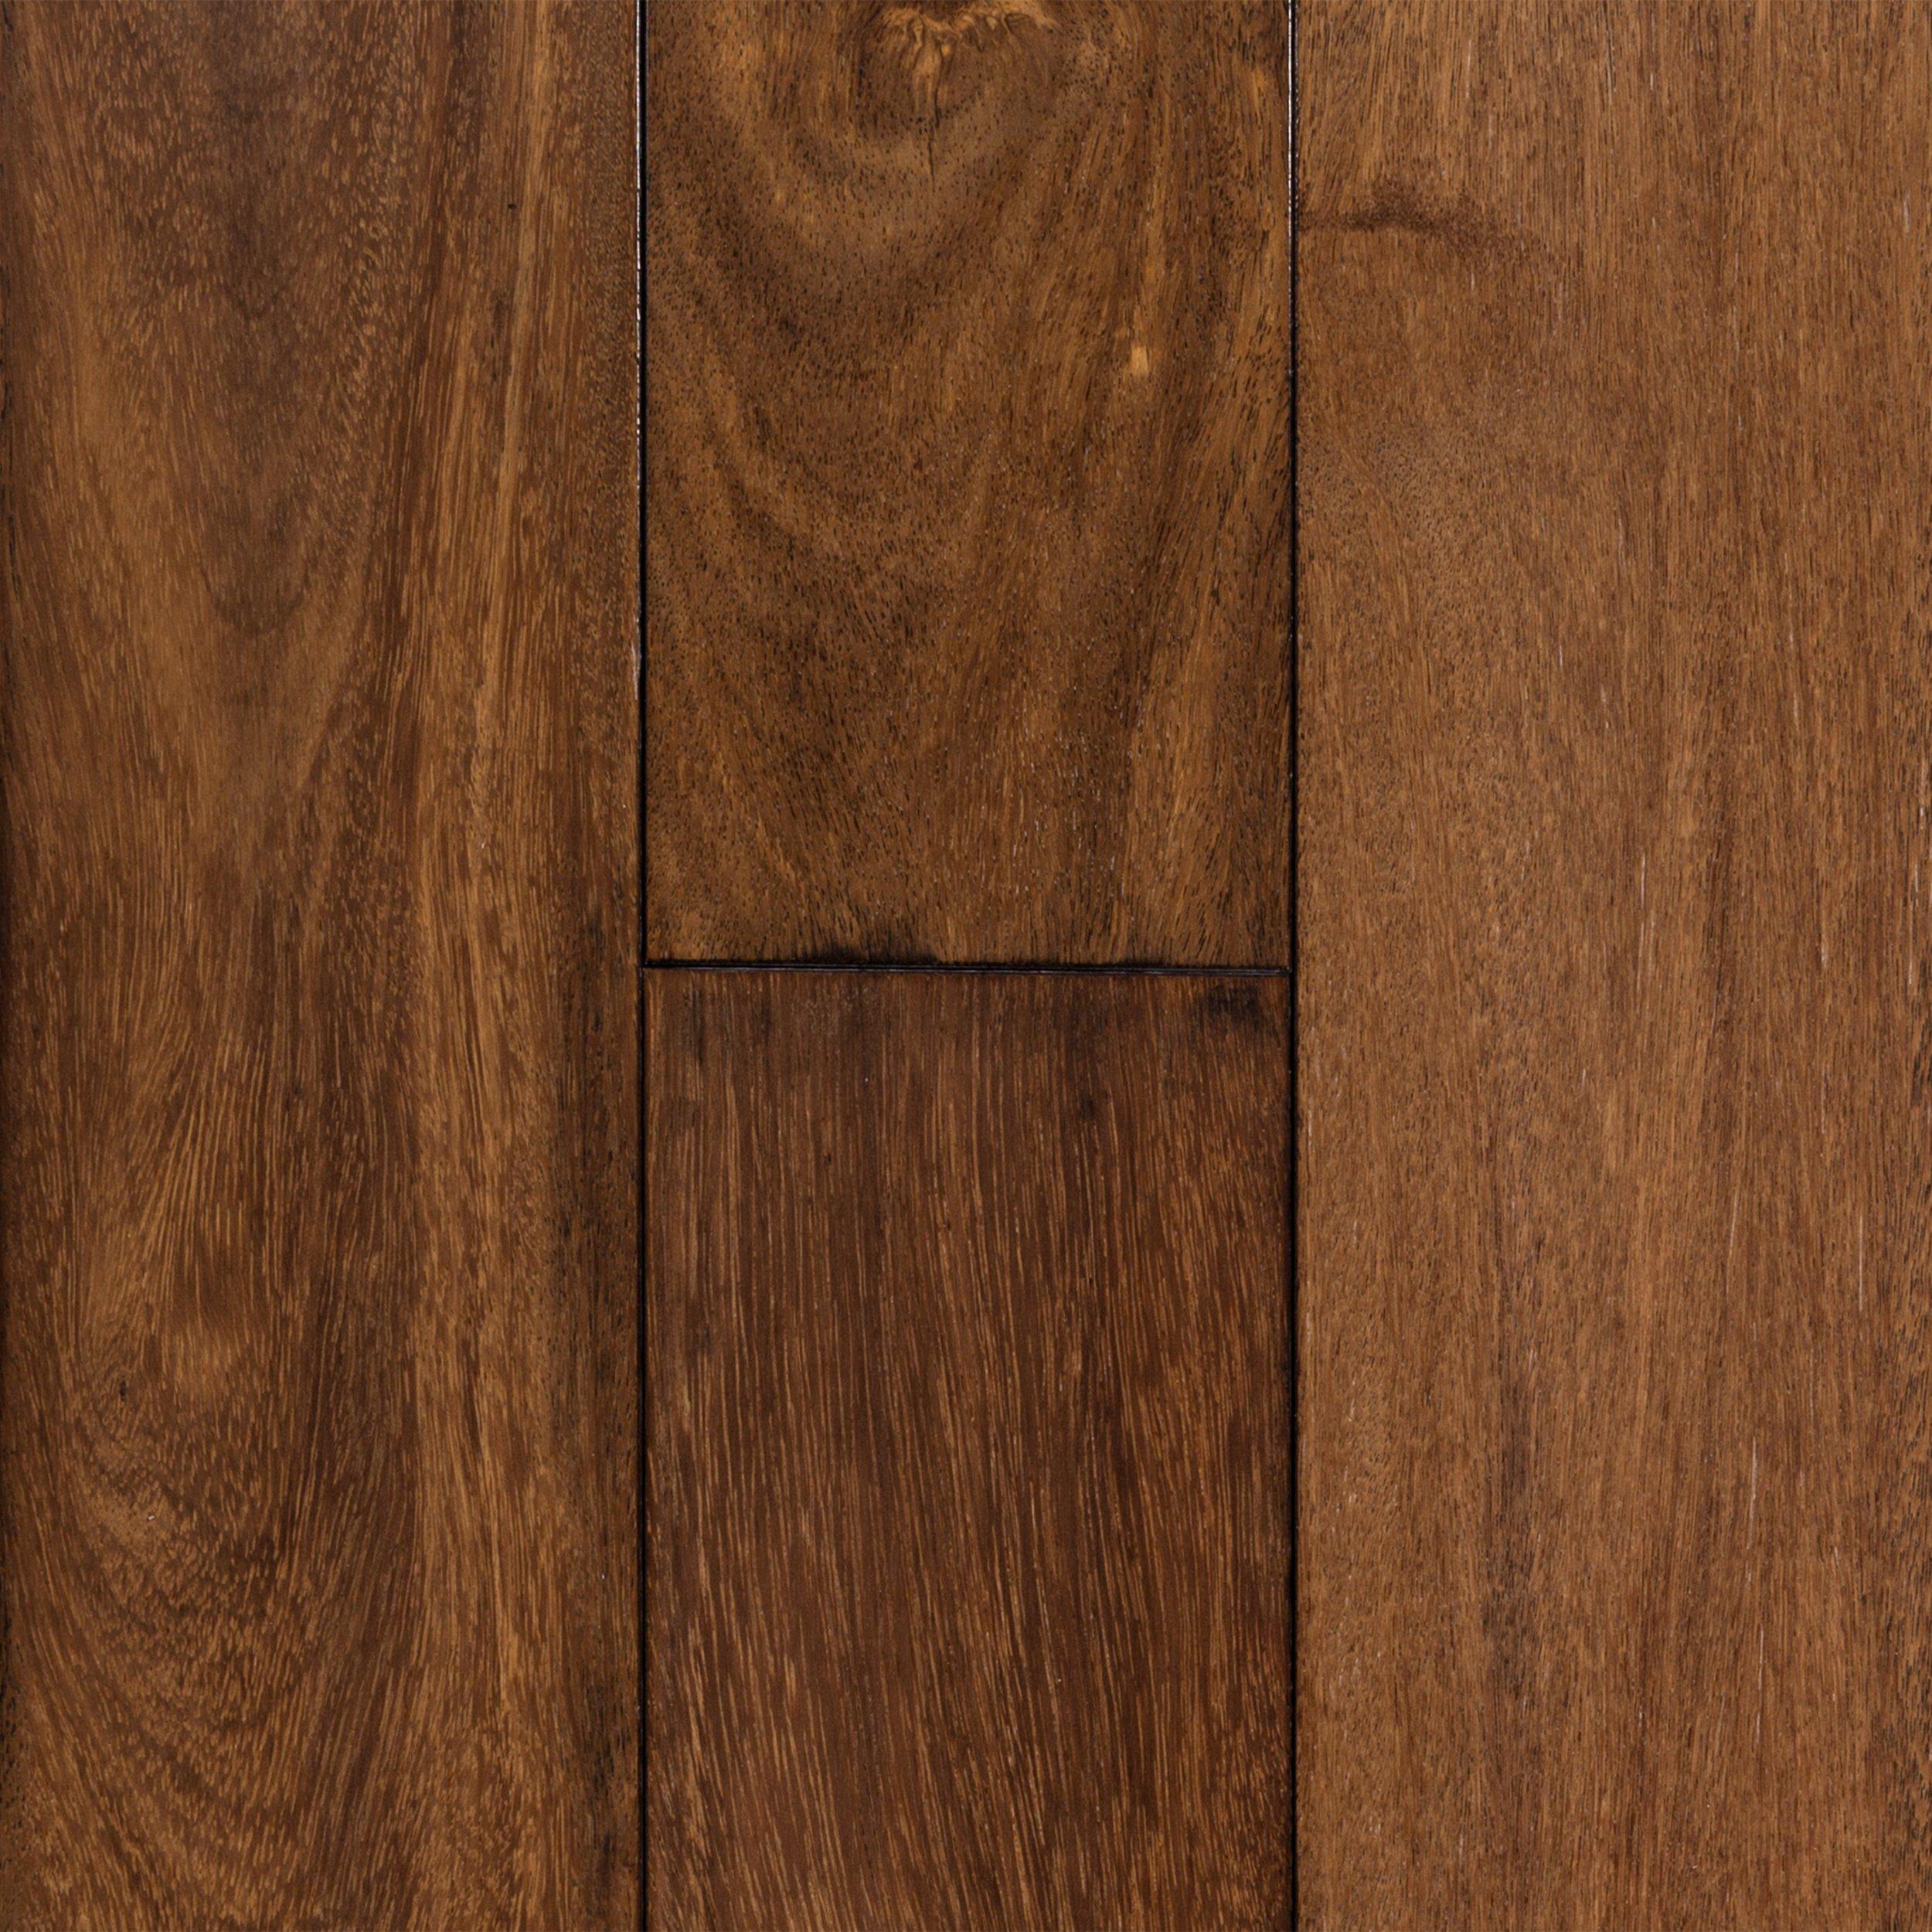 brazilian chestnut hand scraped solid hardwood - Hand Scraped Hardwood